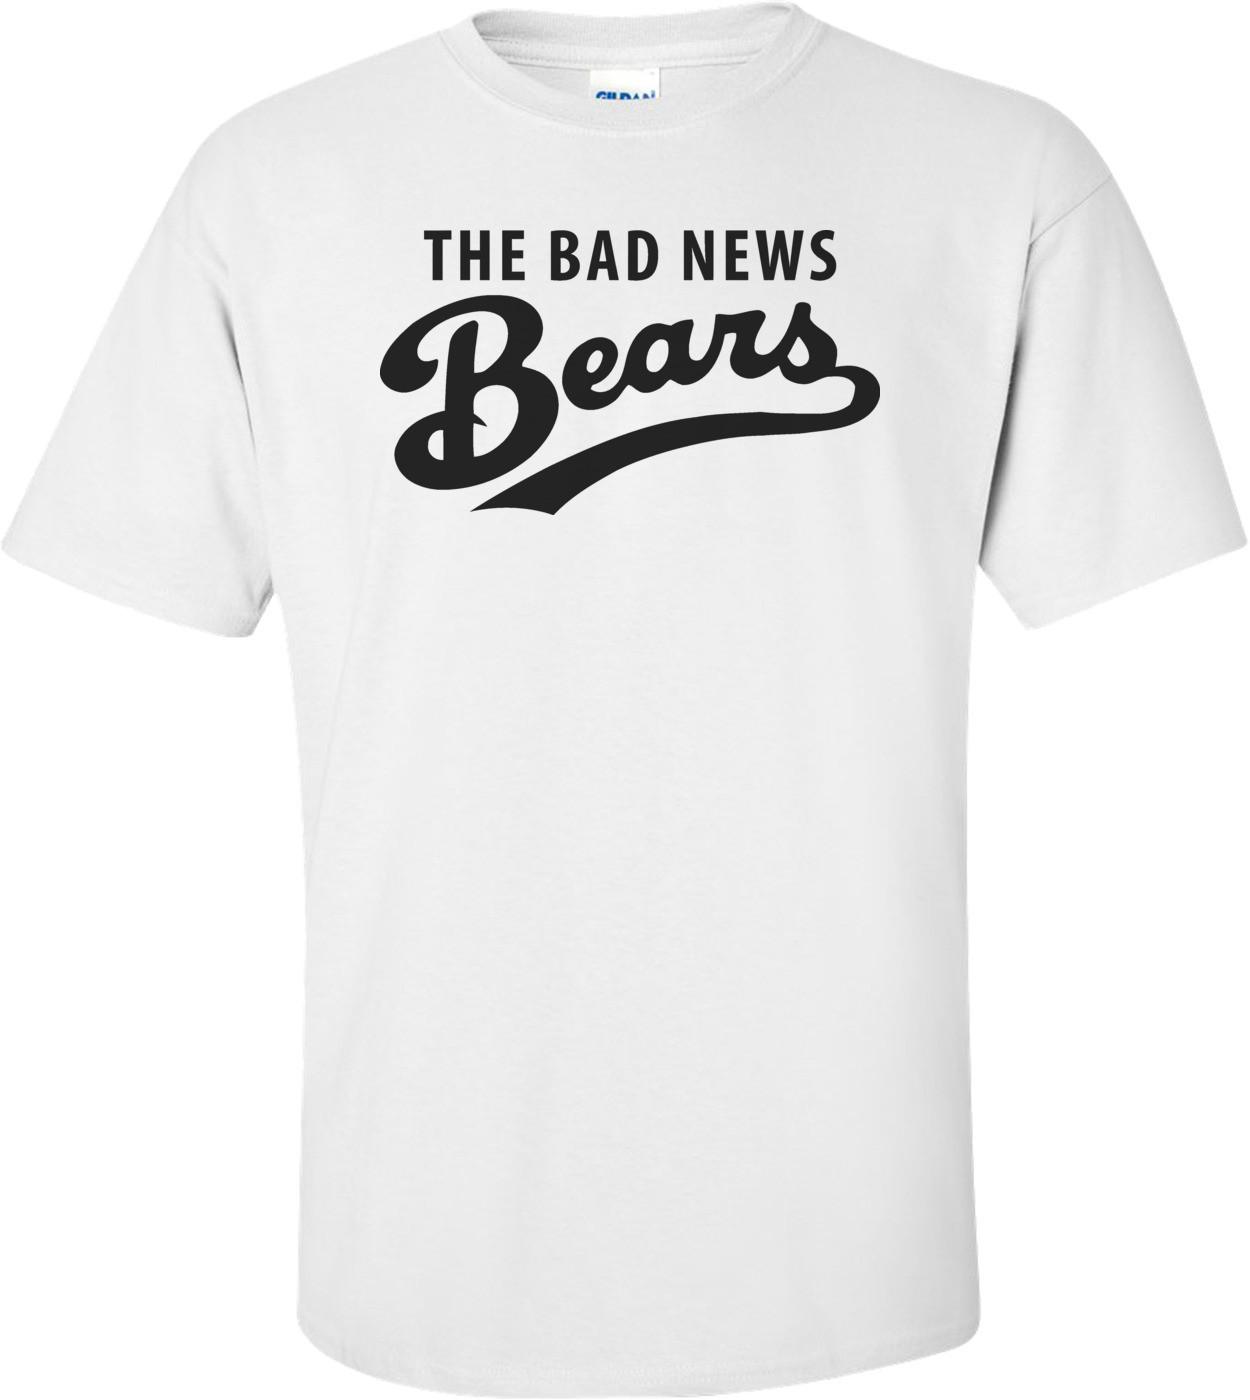 The Bad News Bears T-shirt